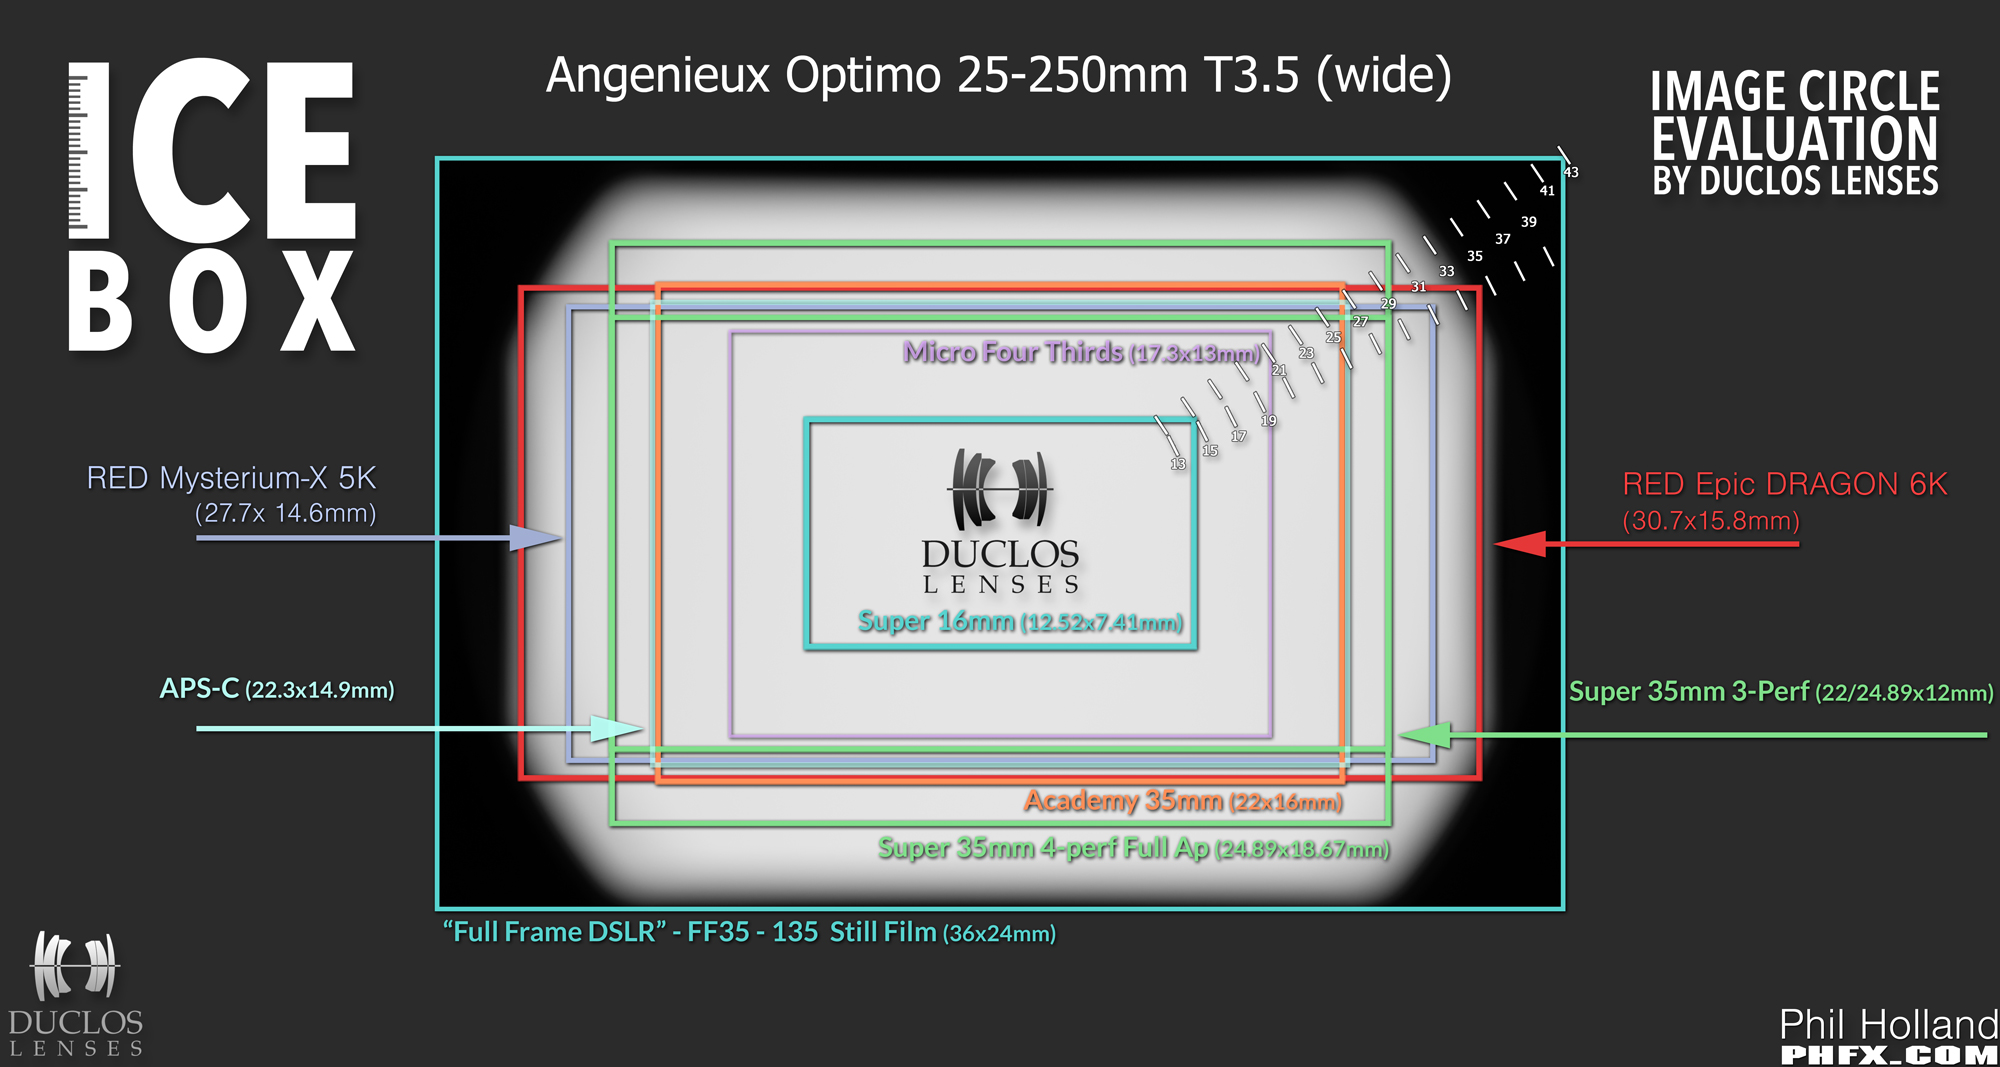 ICEBOX---Angenieux-Optimo-25-250mm-wide